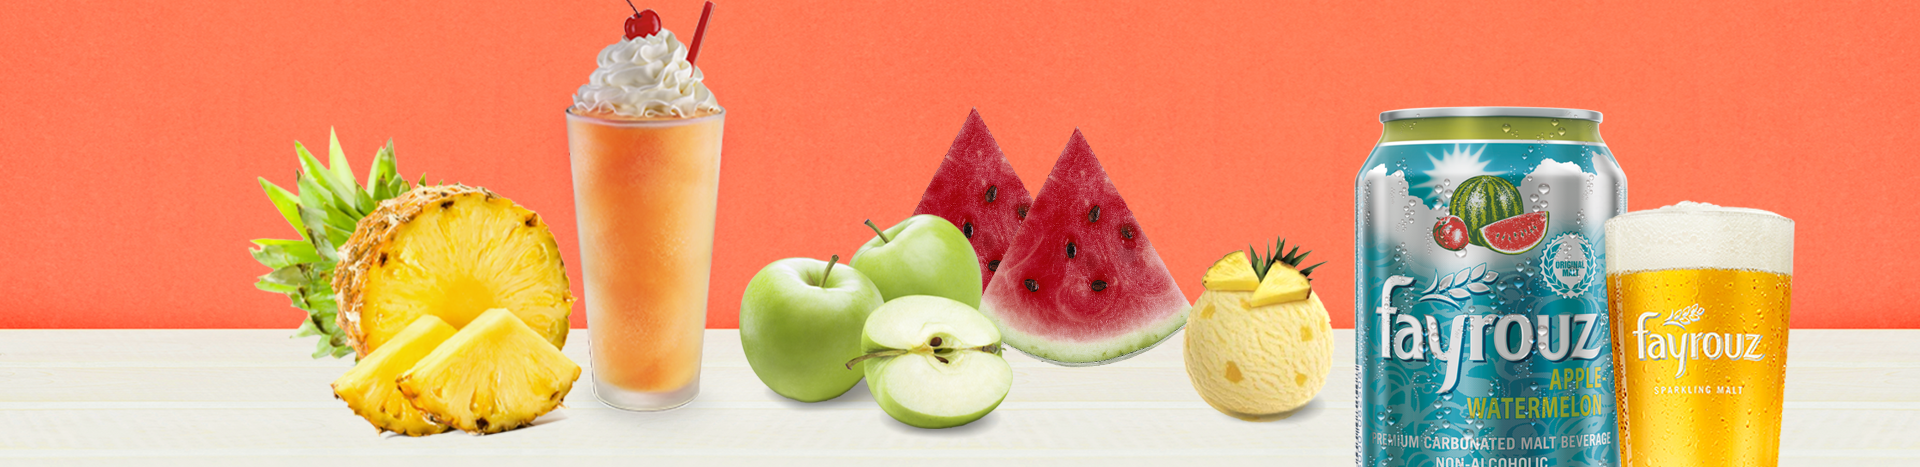 Fayrouz Watermelon & Apple With Pineapple Ice Cream Smoothie